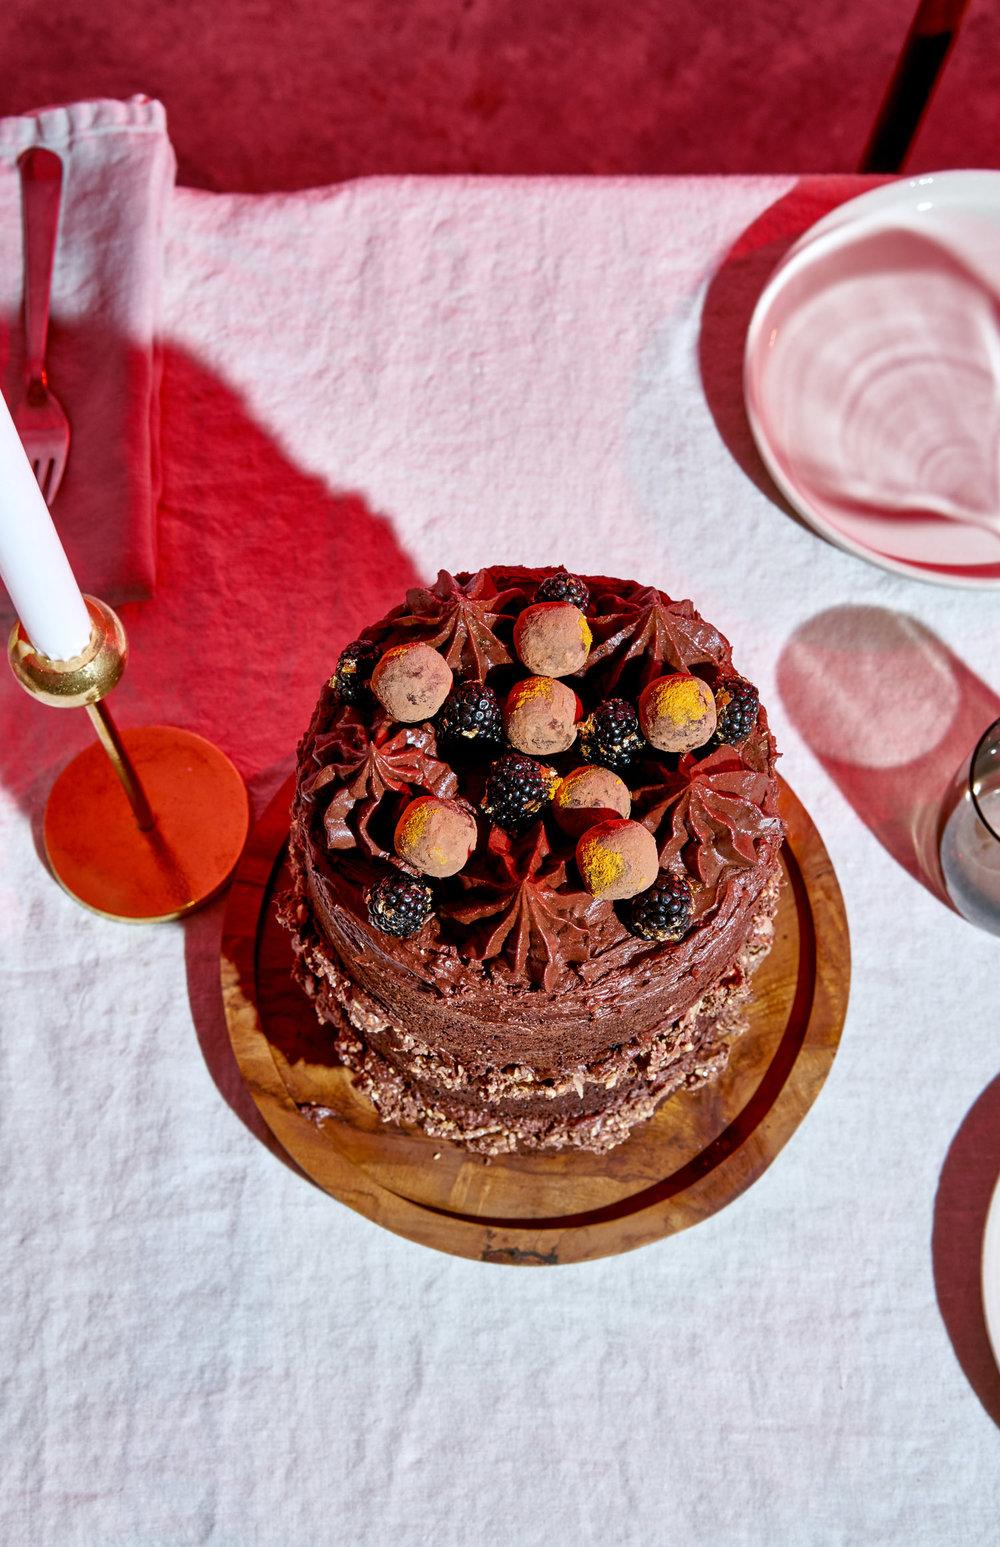 west-elm-xmas-cake-04.jpg